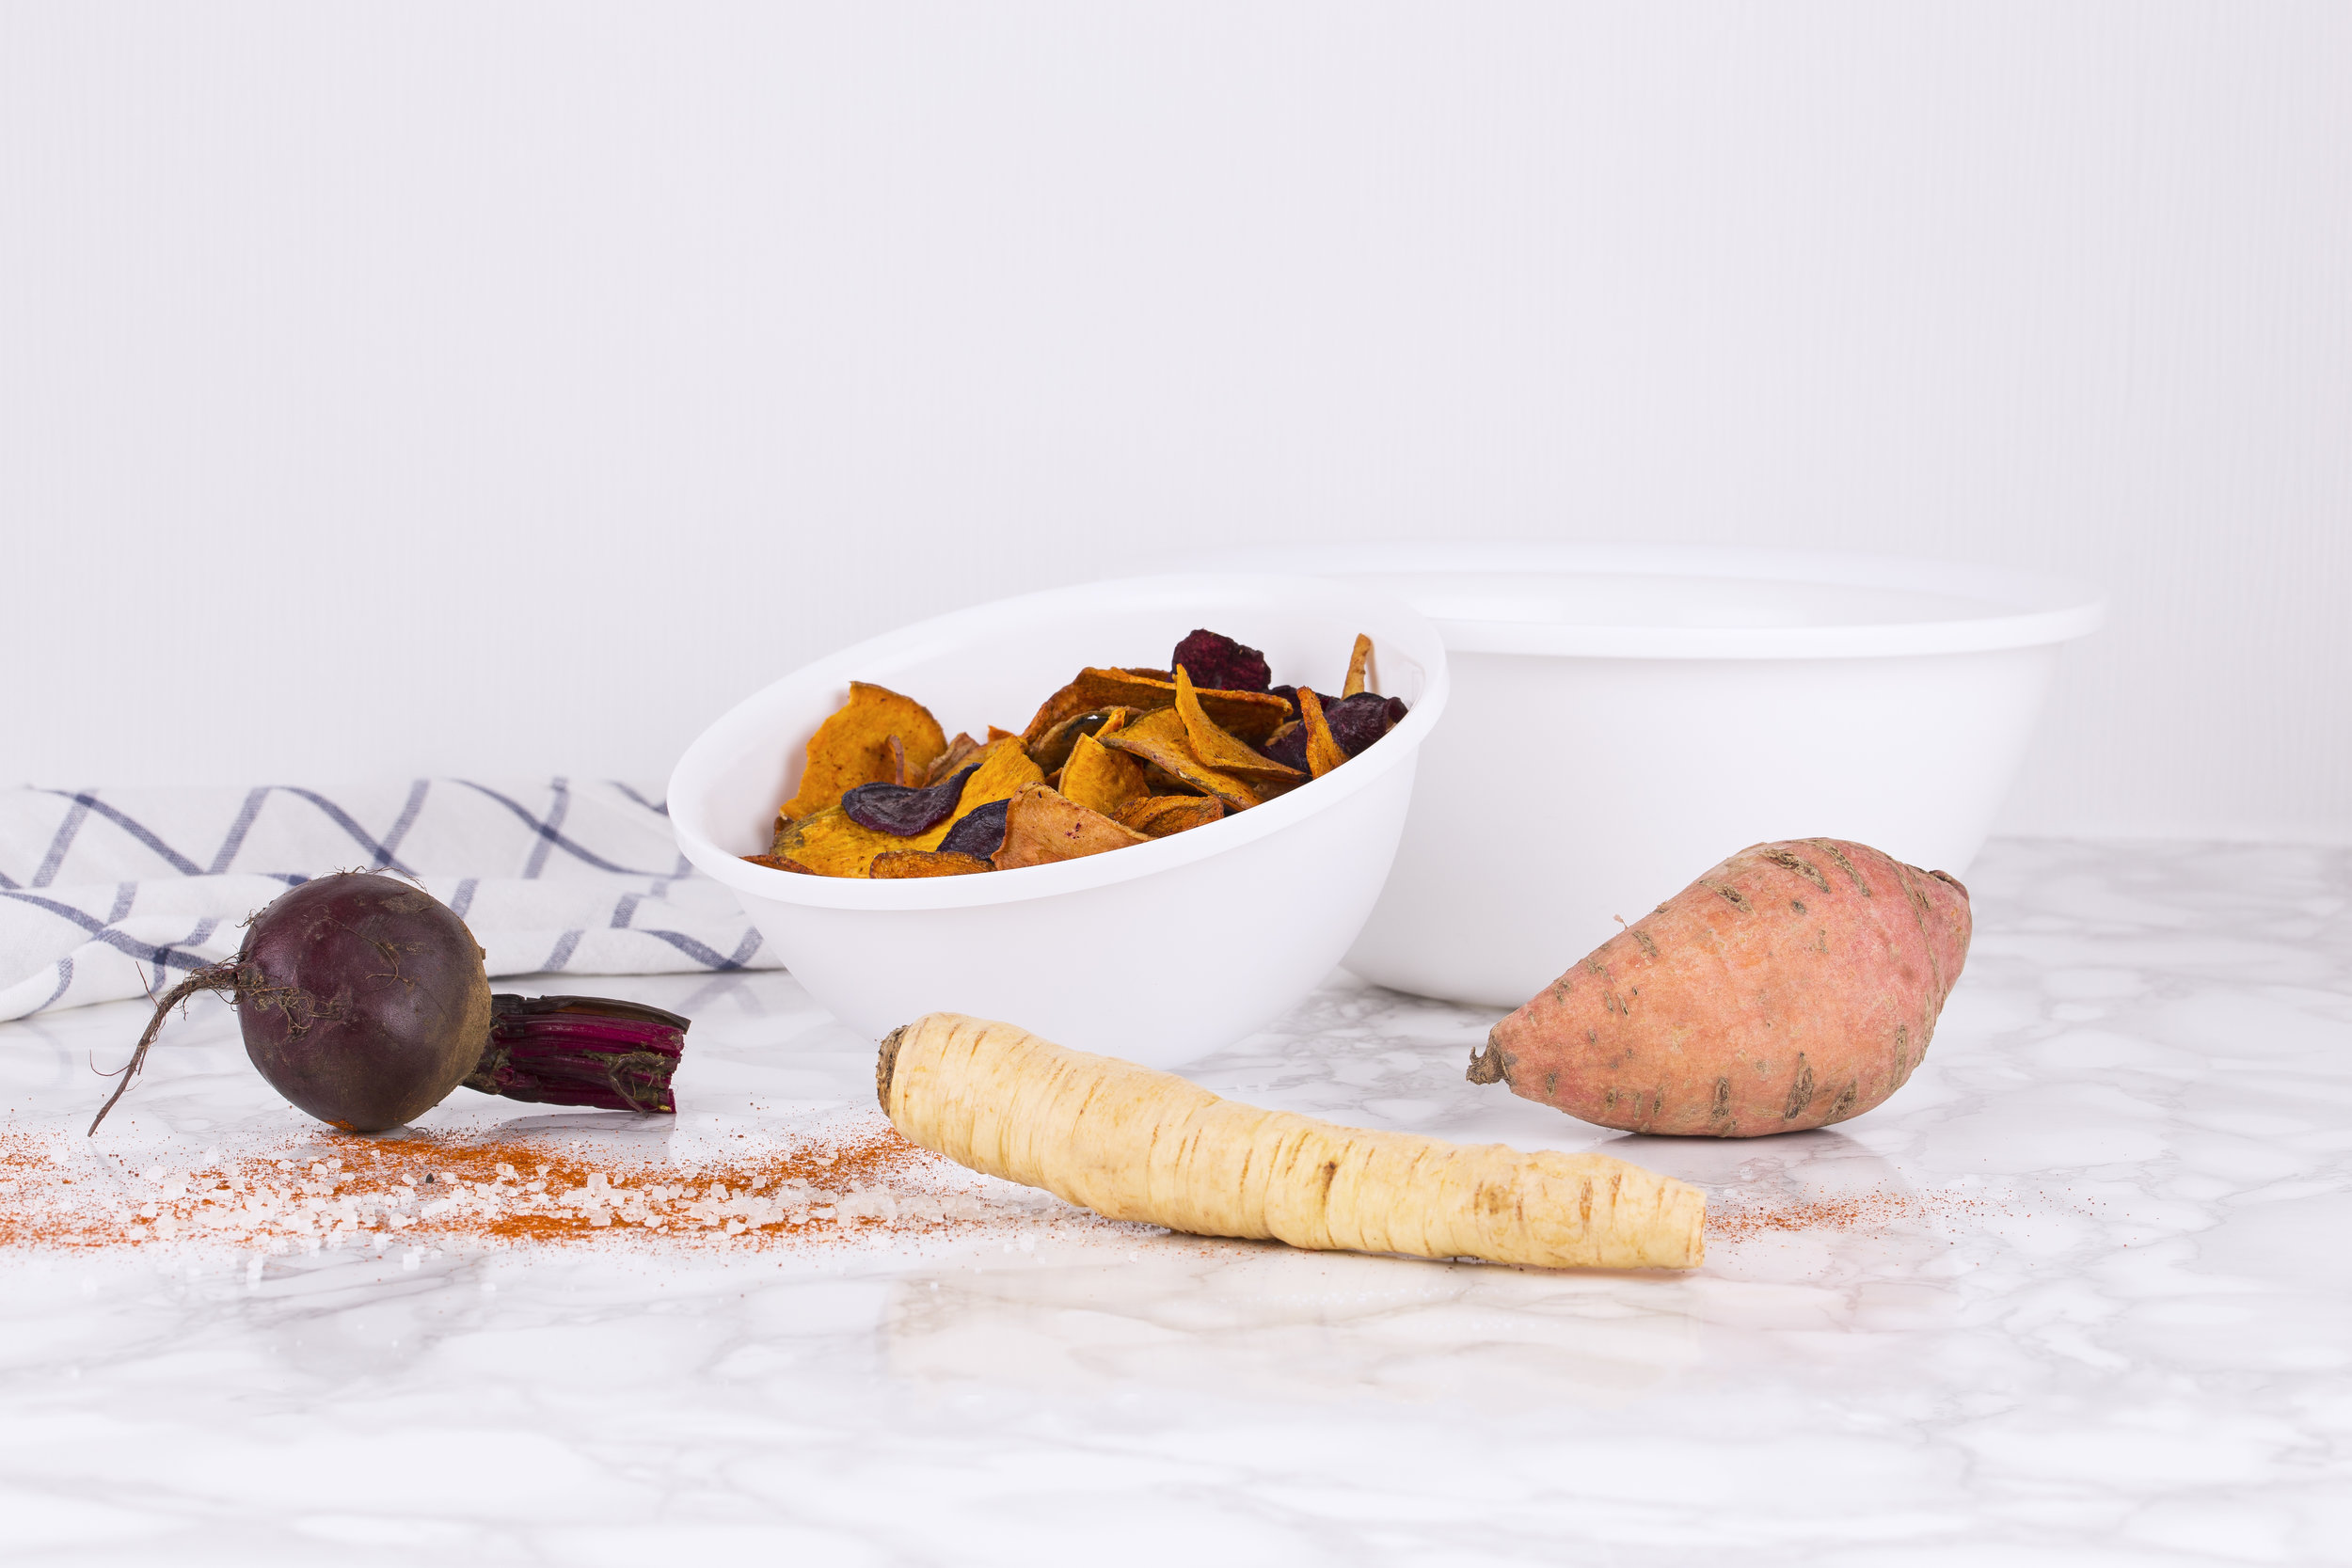 Amuse tip - ....RECIPE Healthy snacks? Try these home-made vegetable crisps: oven-fresh after 45 minutes, without the use of fat, preservatives or additives. Healthy never tasted so good! ..RECETTE Grignoter sainement ? Les chips de légumes sont la collation idéale : sortis du four après 45 minutes, sans graisses, ni agents conservateurs ou additifs. Manger sainement n'a jamais été aussi délicieux ! ..RECEPT Gezond snacken? Dat doe je met deze zelfgemaakte groentechips: ovenvers na 45 minuten, zonder vetstoffen, bewaarmiddelen of additieven. Gezond was nog nooit zo lekker! ..REZEPT Gesunde Snacks? Das sind diese selbstgemachten Gemüsechips: ofenfrisch nach 45 Minuten, ohne Fettstoffe, Konservierungsmittel oder Zusatzstoffe. Gesund war noch nie so lecker! ....